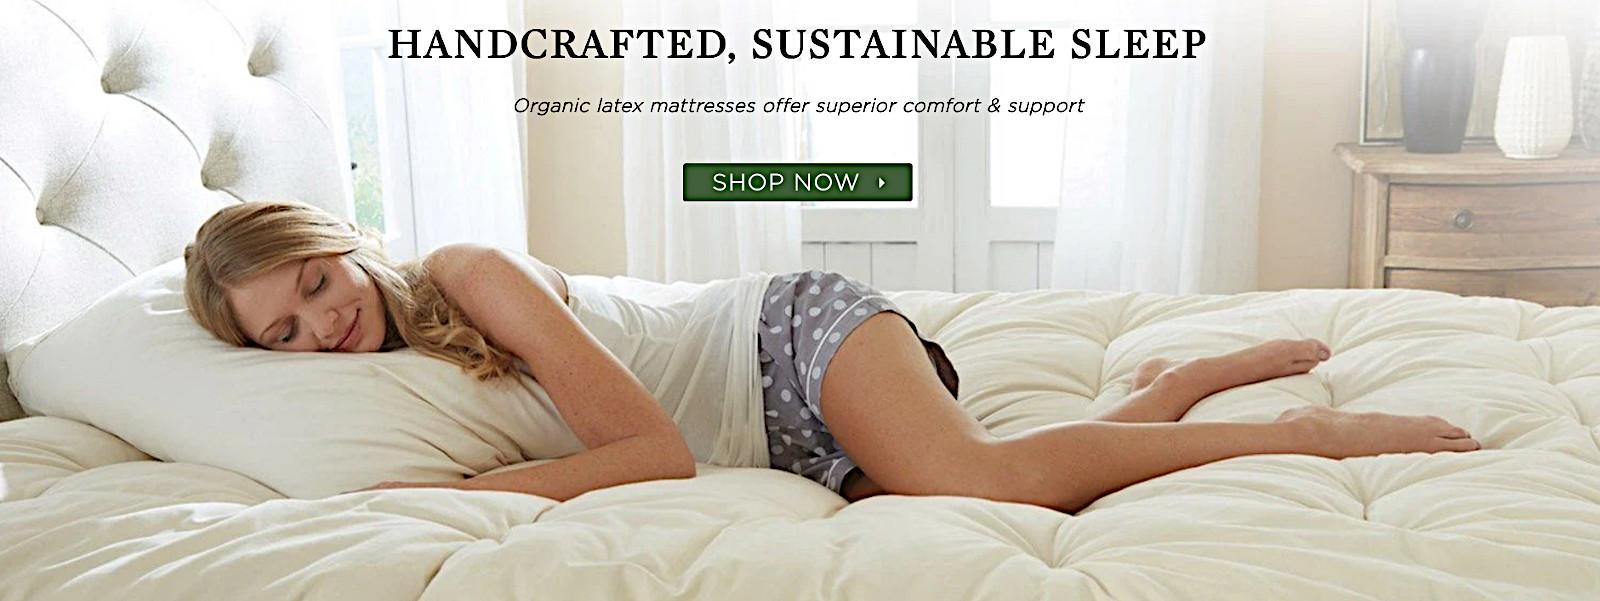 Longstanding organic natural latex mattresses